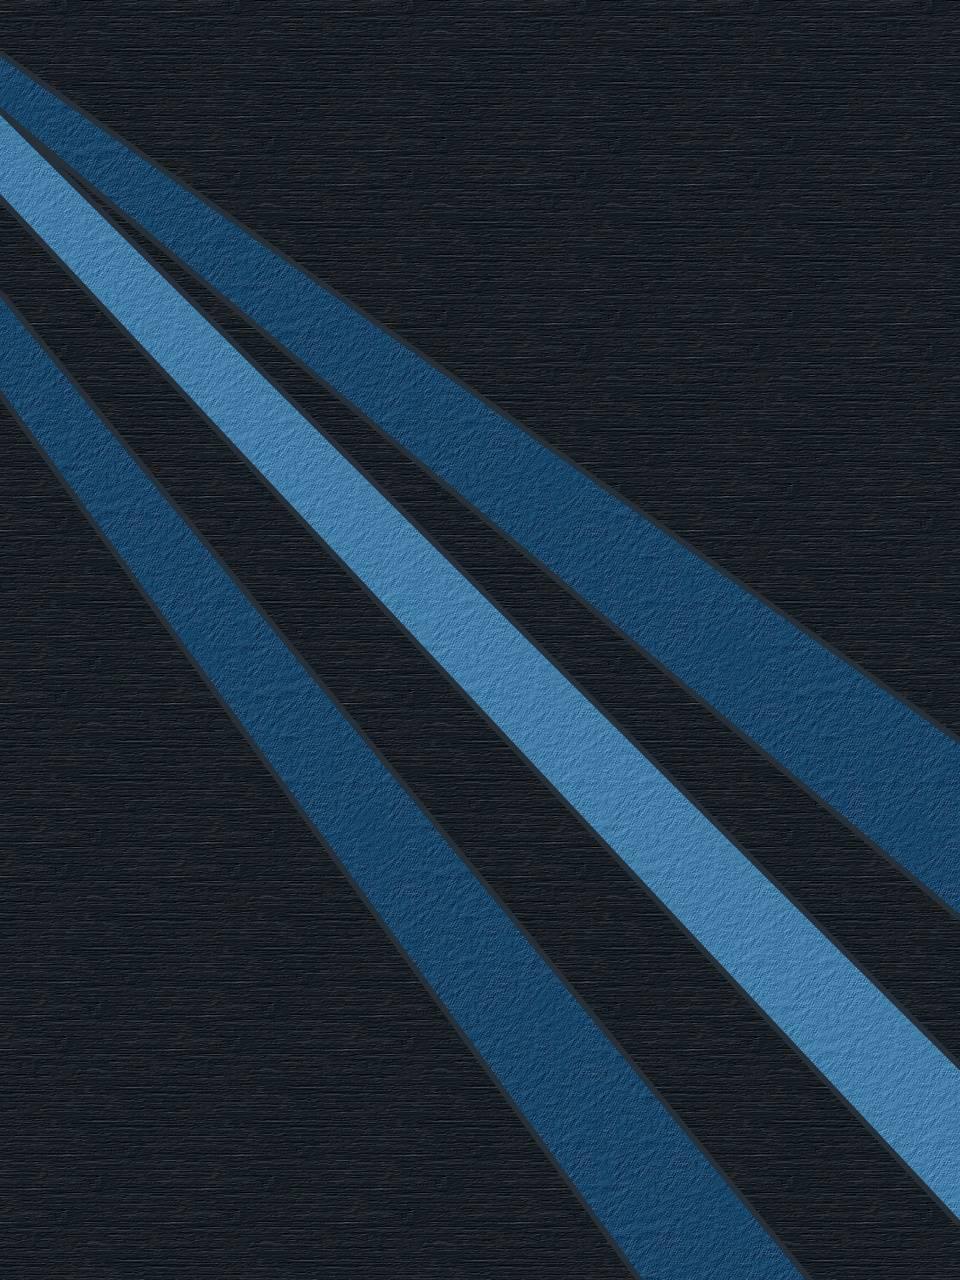 HQ Blue Art Screen